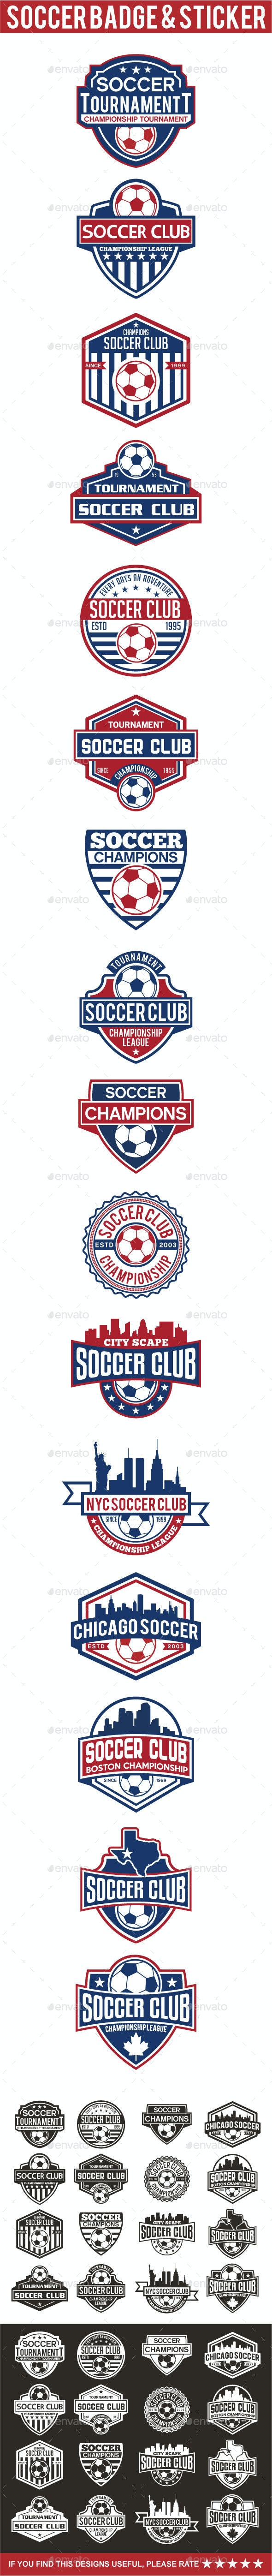 Soccer Badge & Sticker - Badges & Stickers Web Elements